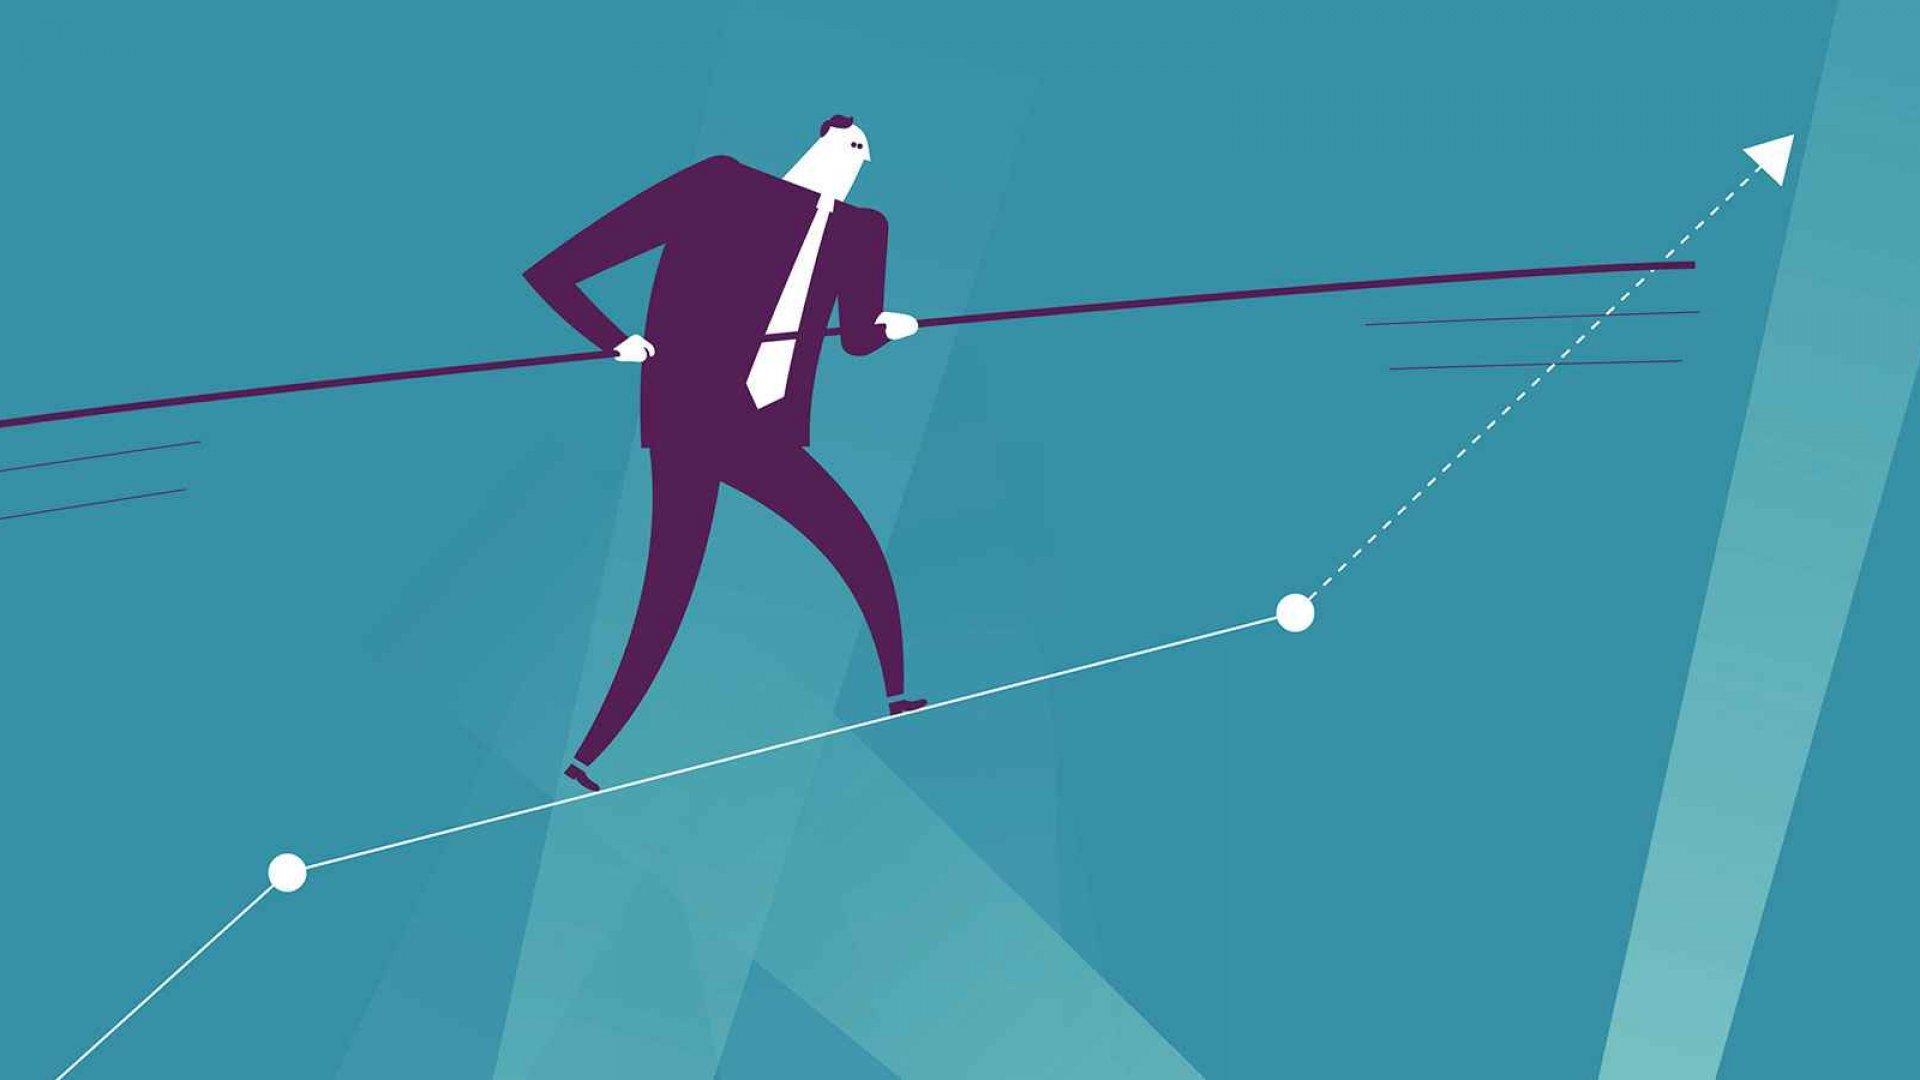 Gary Vaynerchuk on How to Avoid Running a Mediocre Company